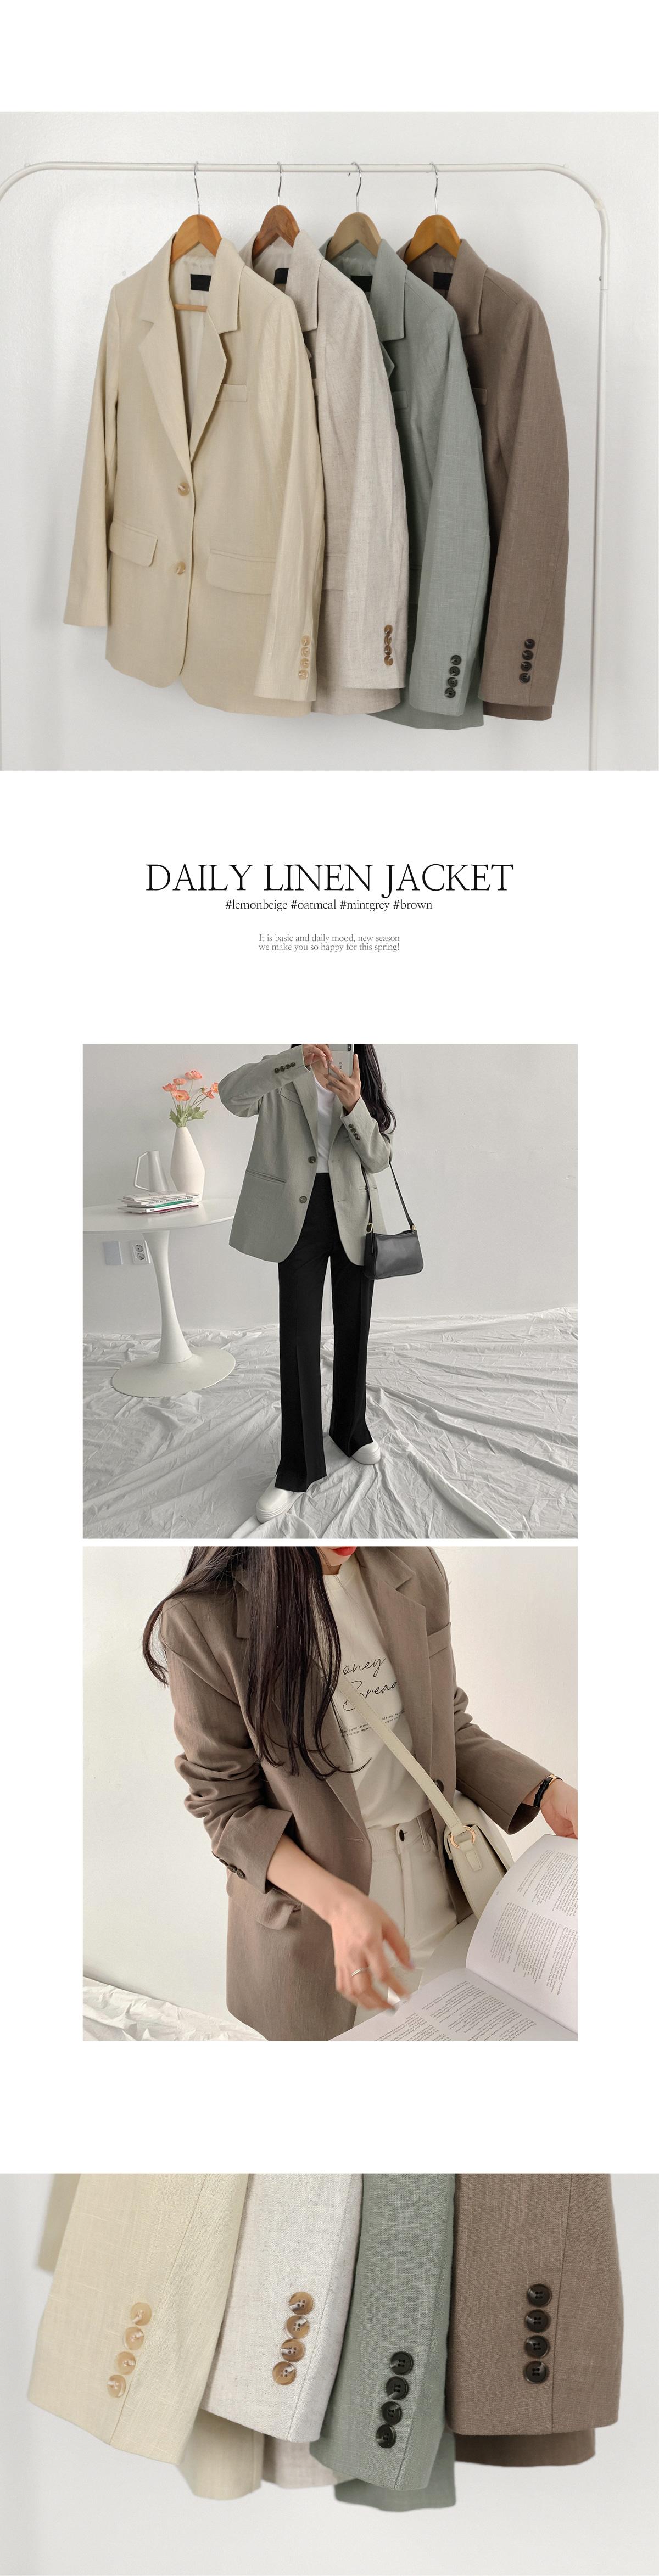 Caplinen jacket